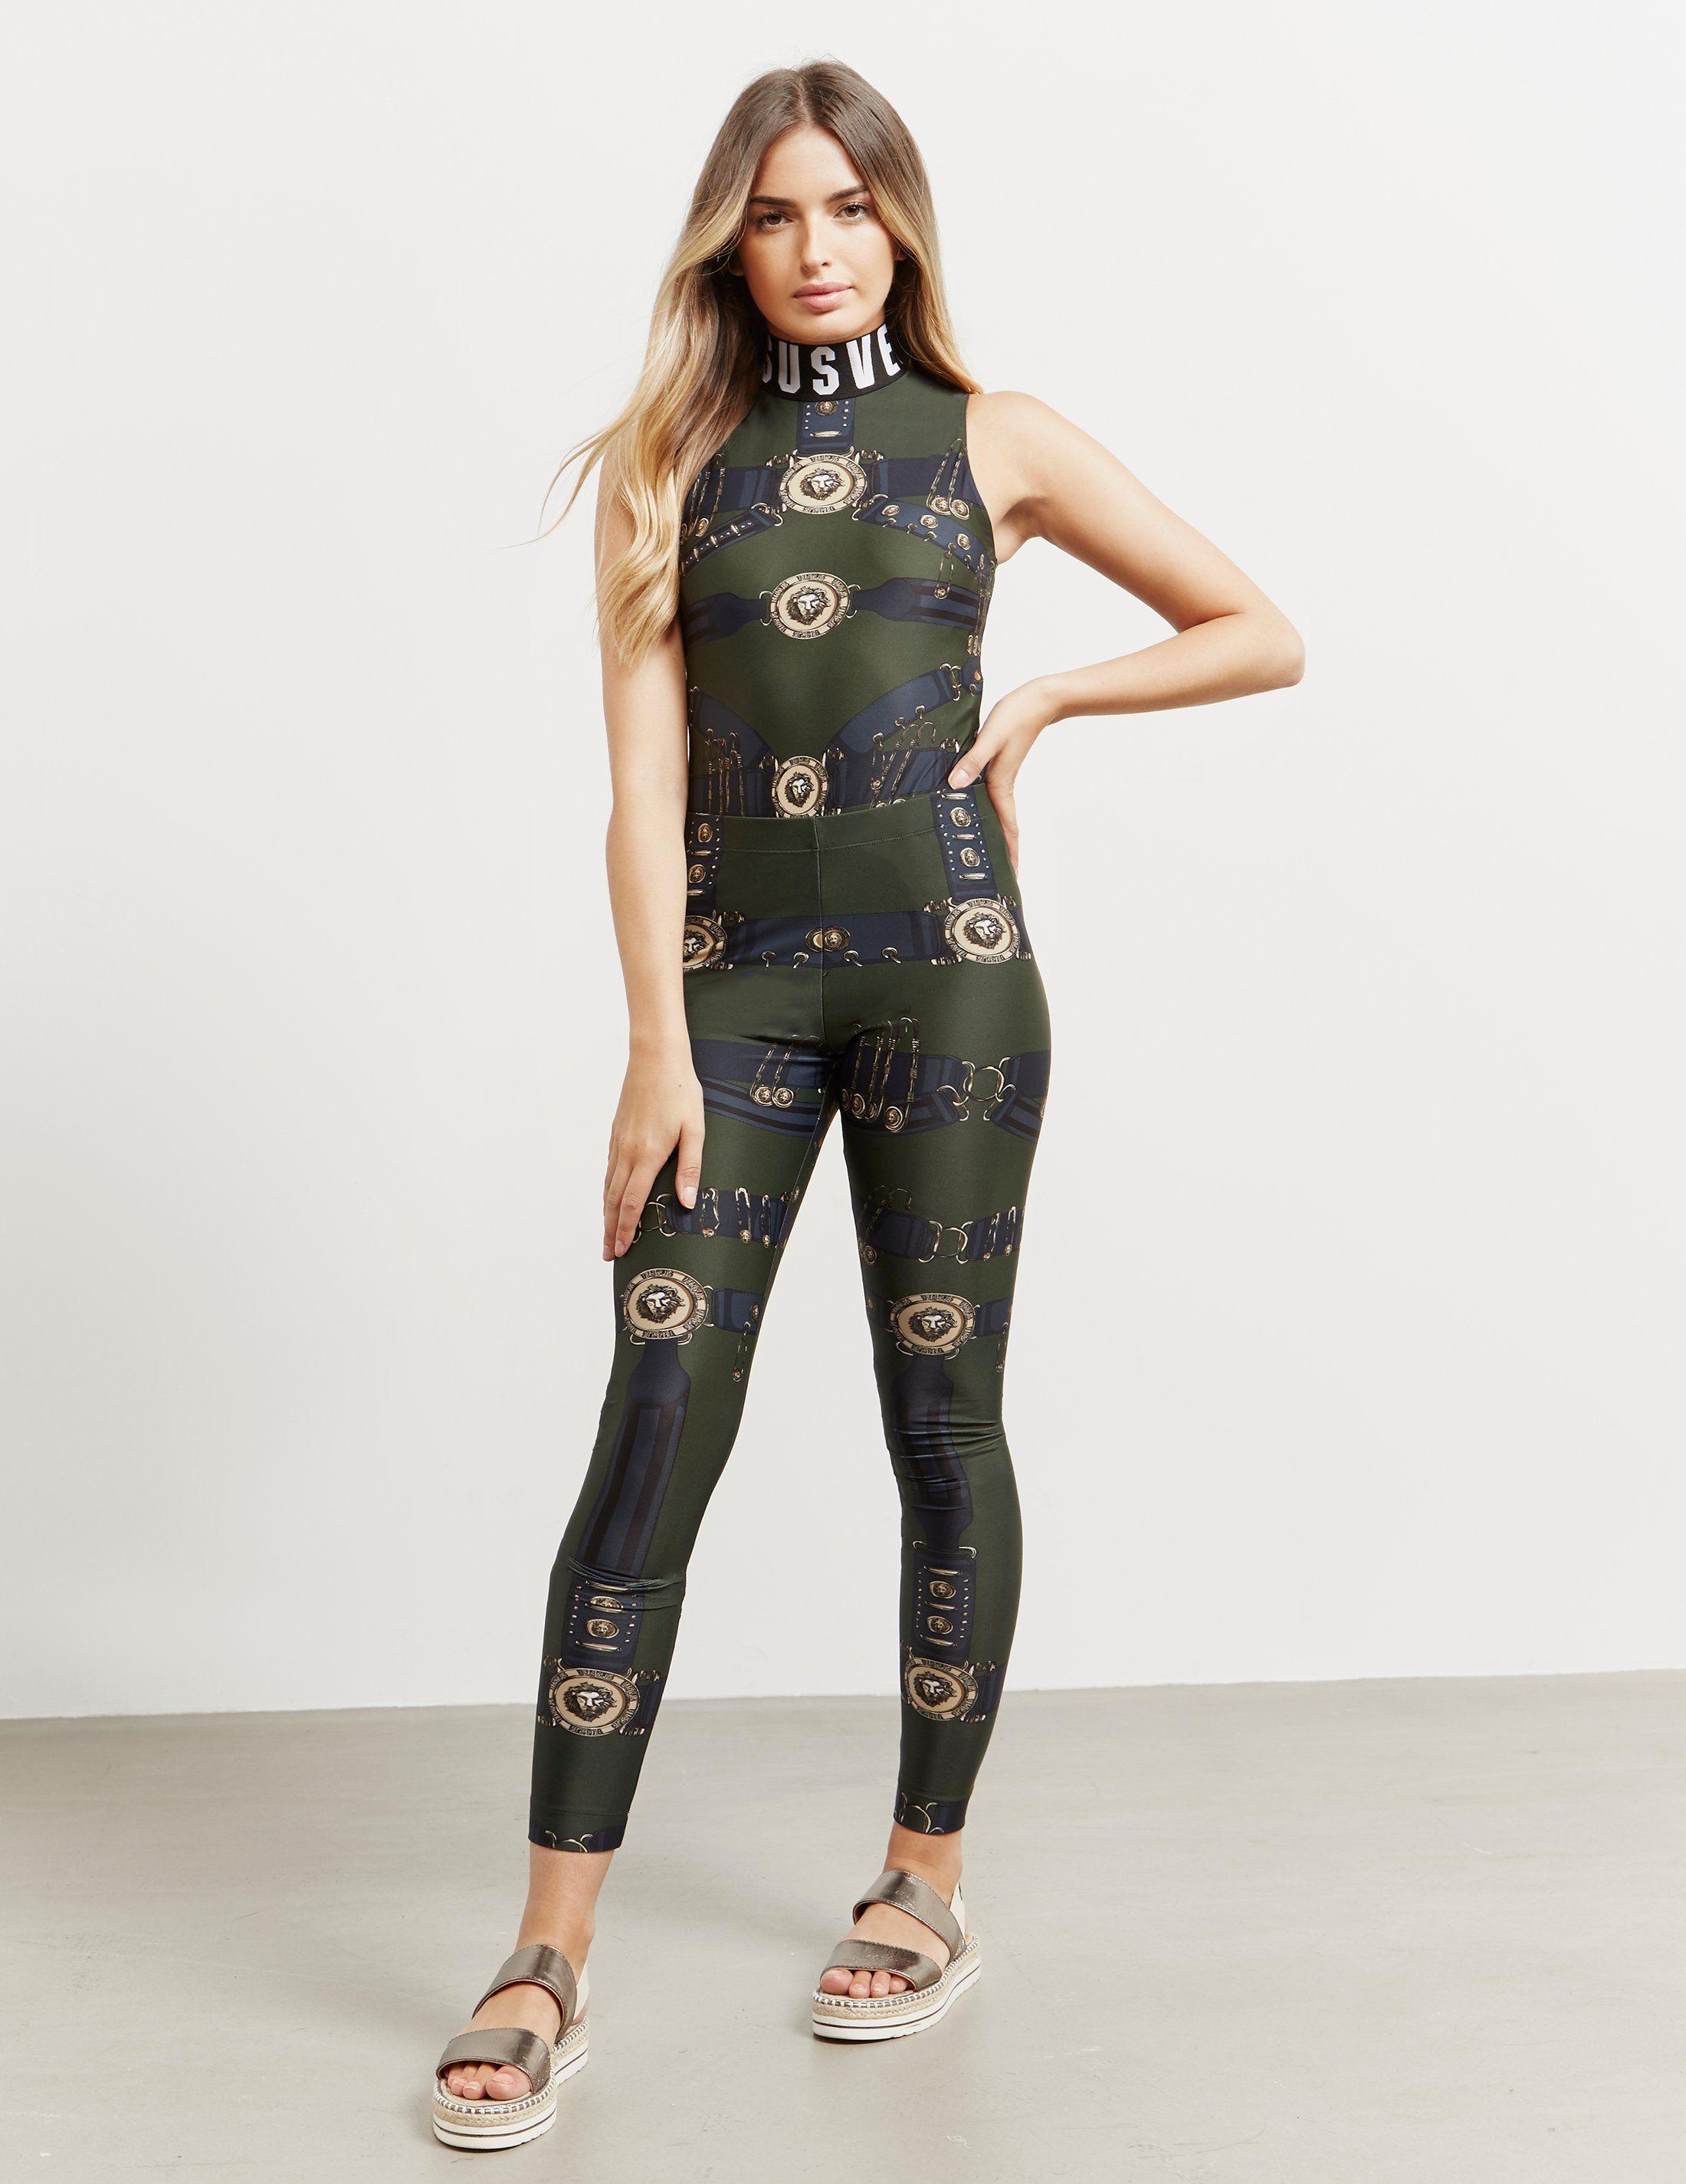 Versus Versace Graphic Print Leggings - Online Exclusive